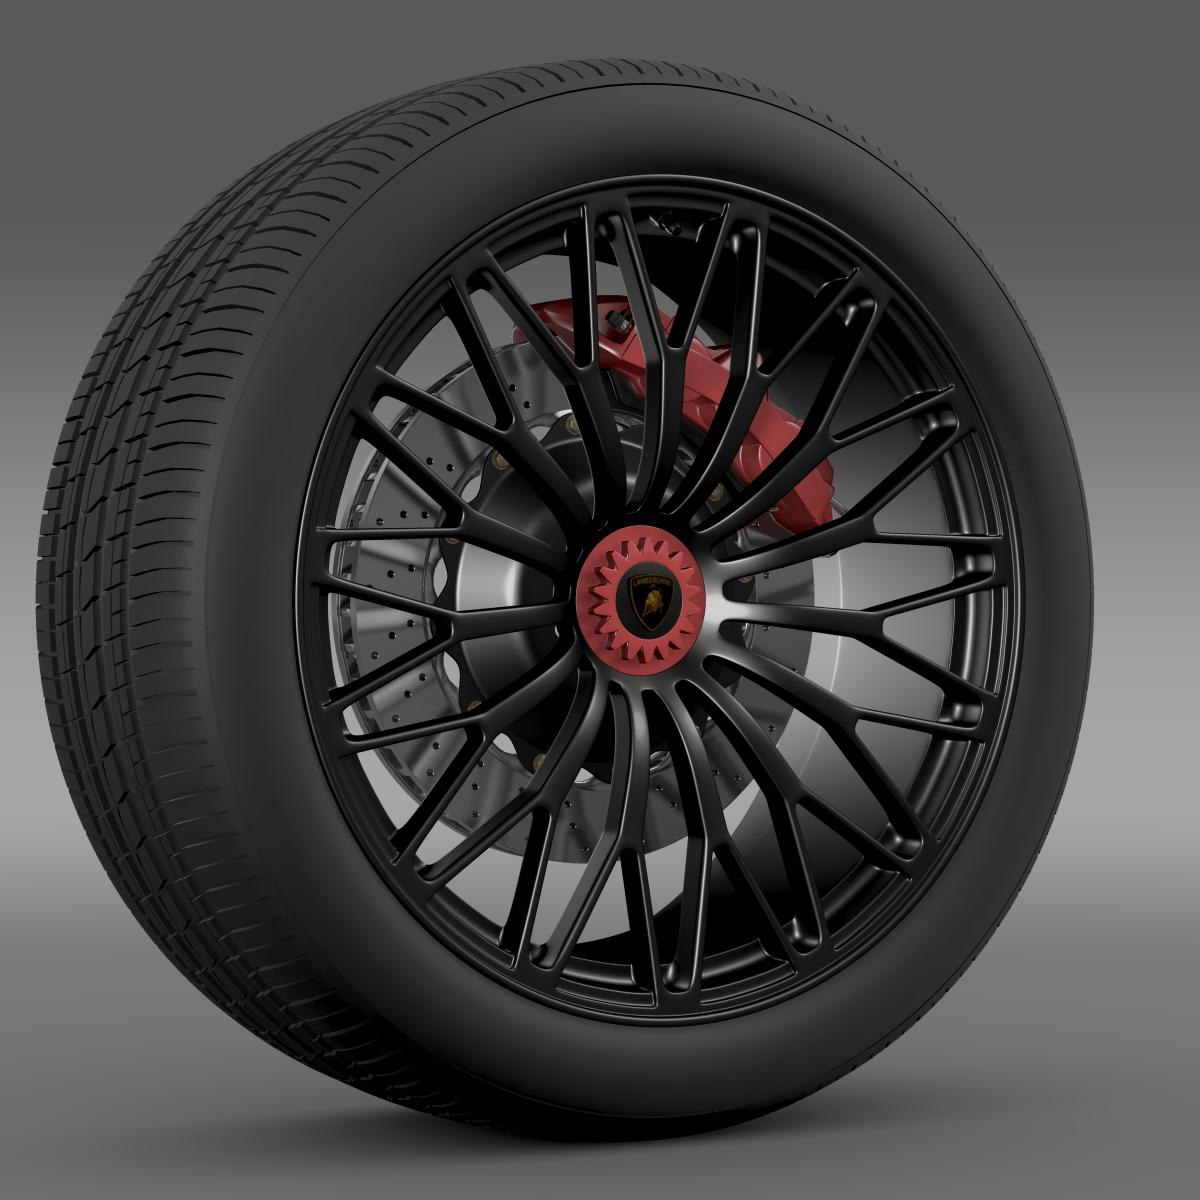 lamborghini aventador lp 750 4 sv wheel 3d model 3ds max fbx c4d lwo ma mb hrc xsi obj 210714